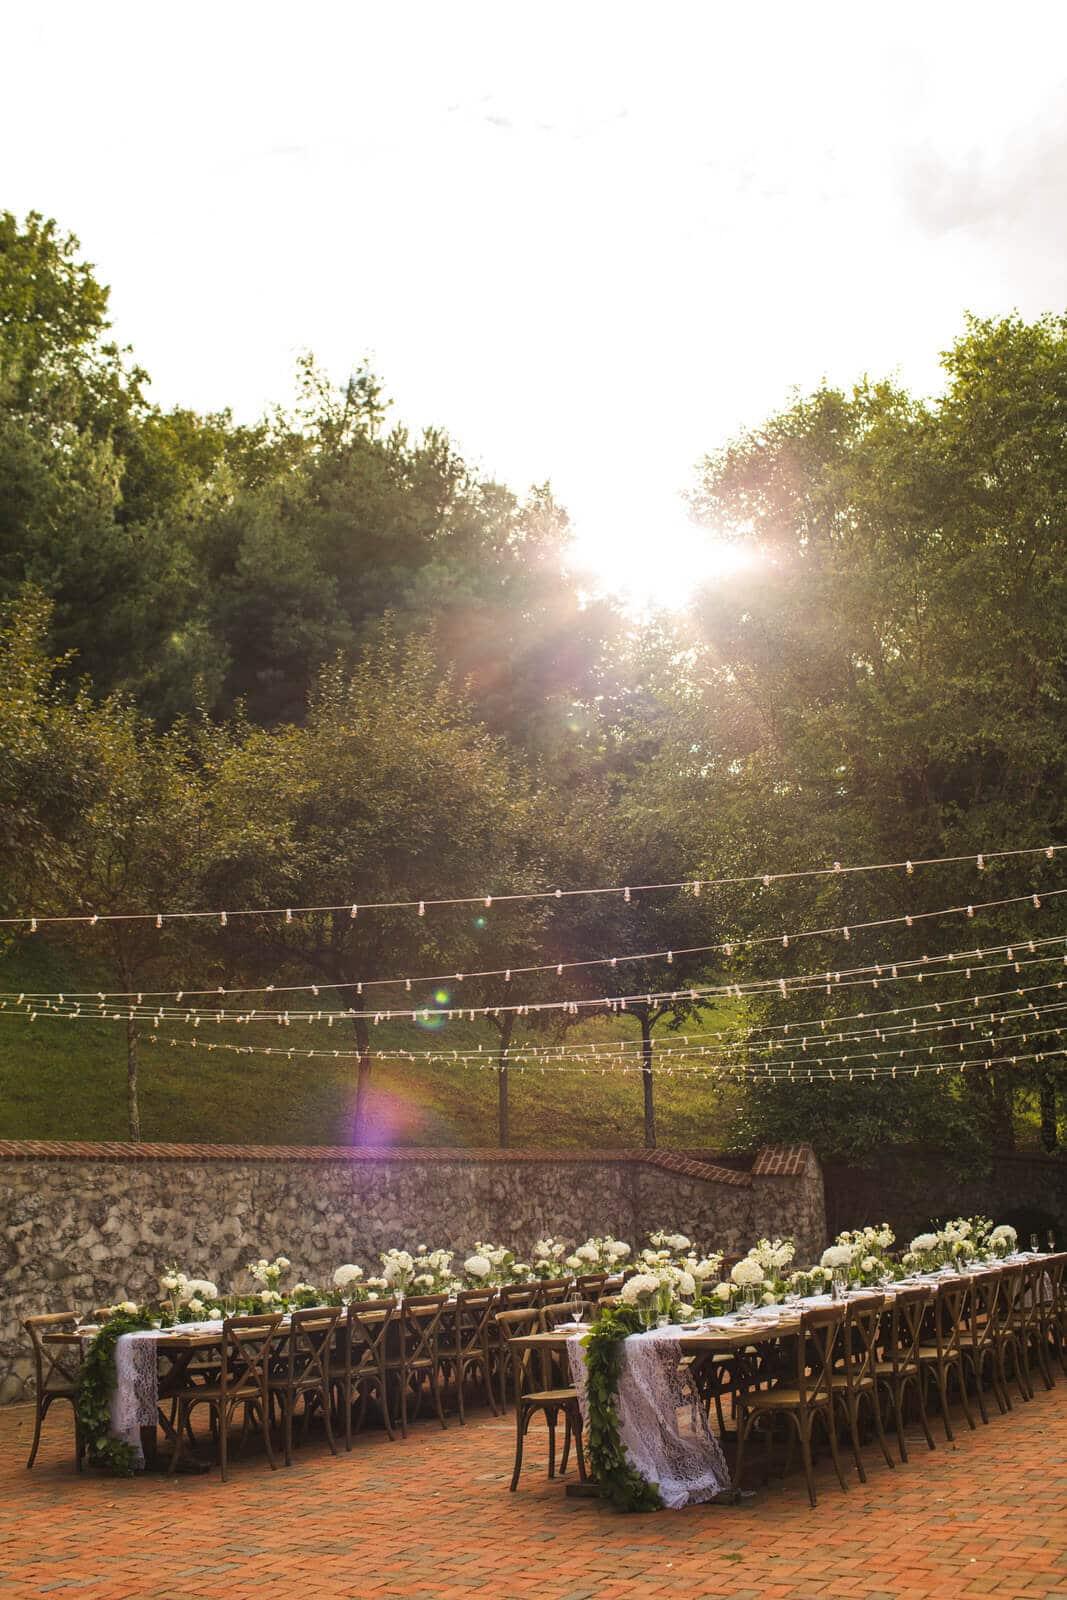 Weddings - Adam Lowe Photography | Editorial wedding, fashion, and ...